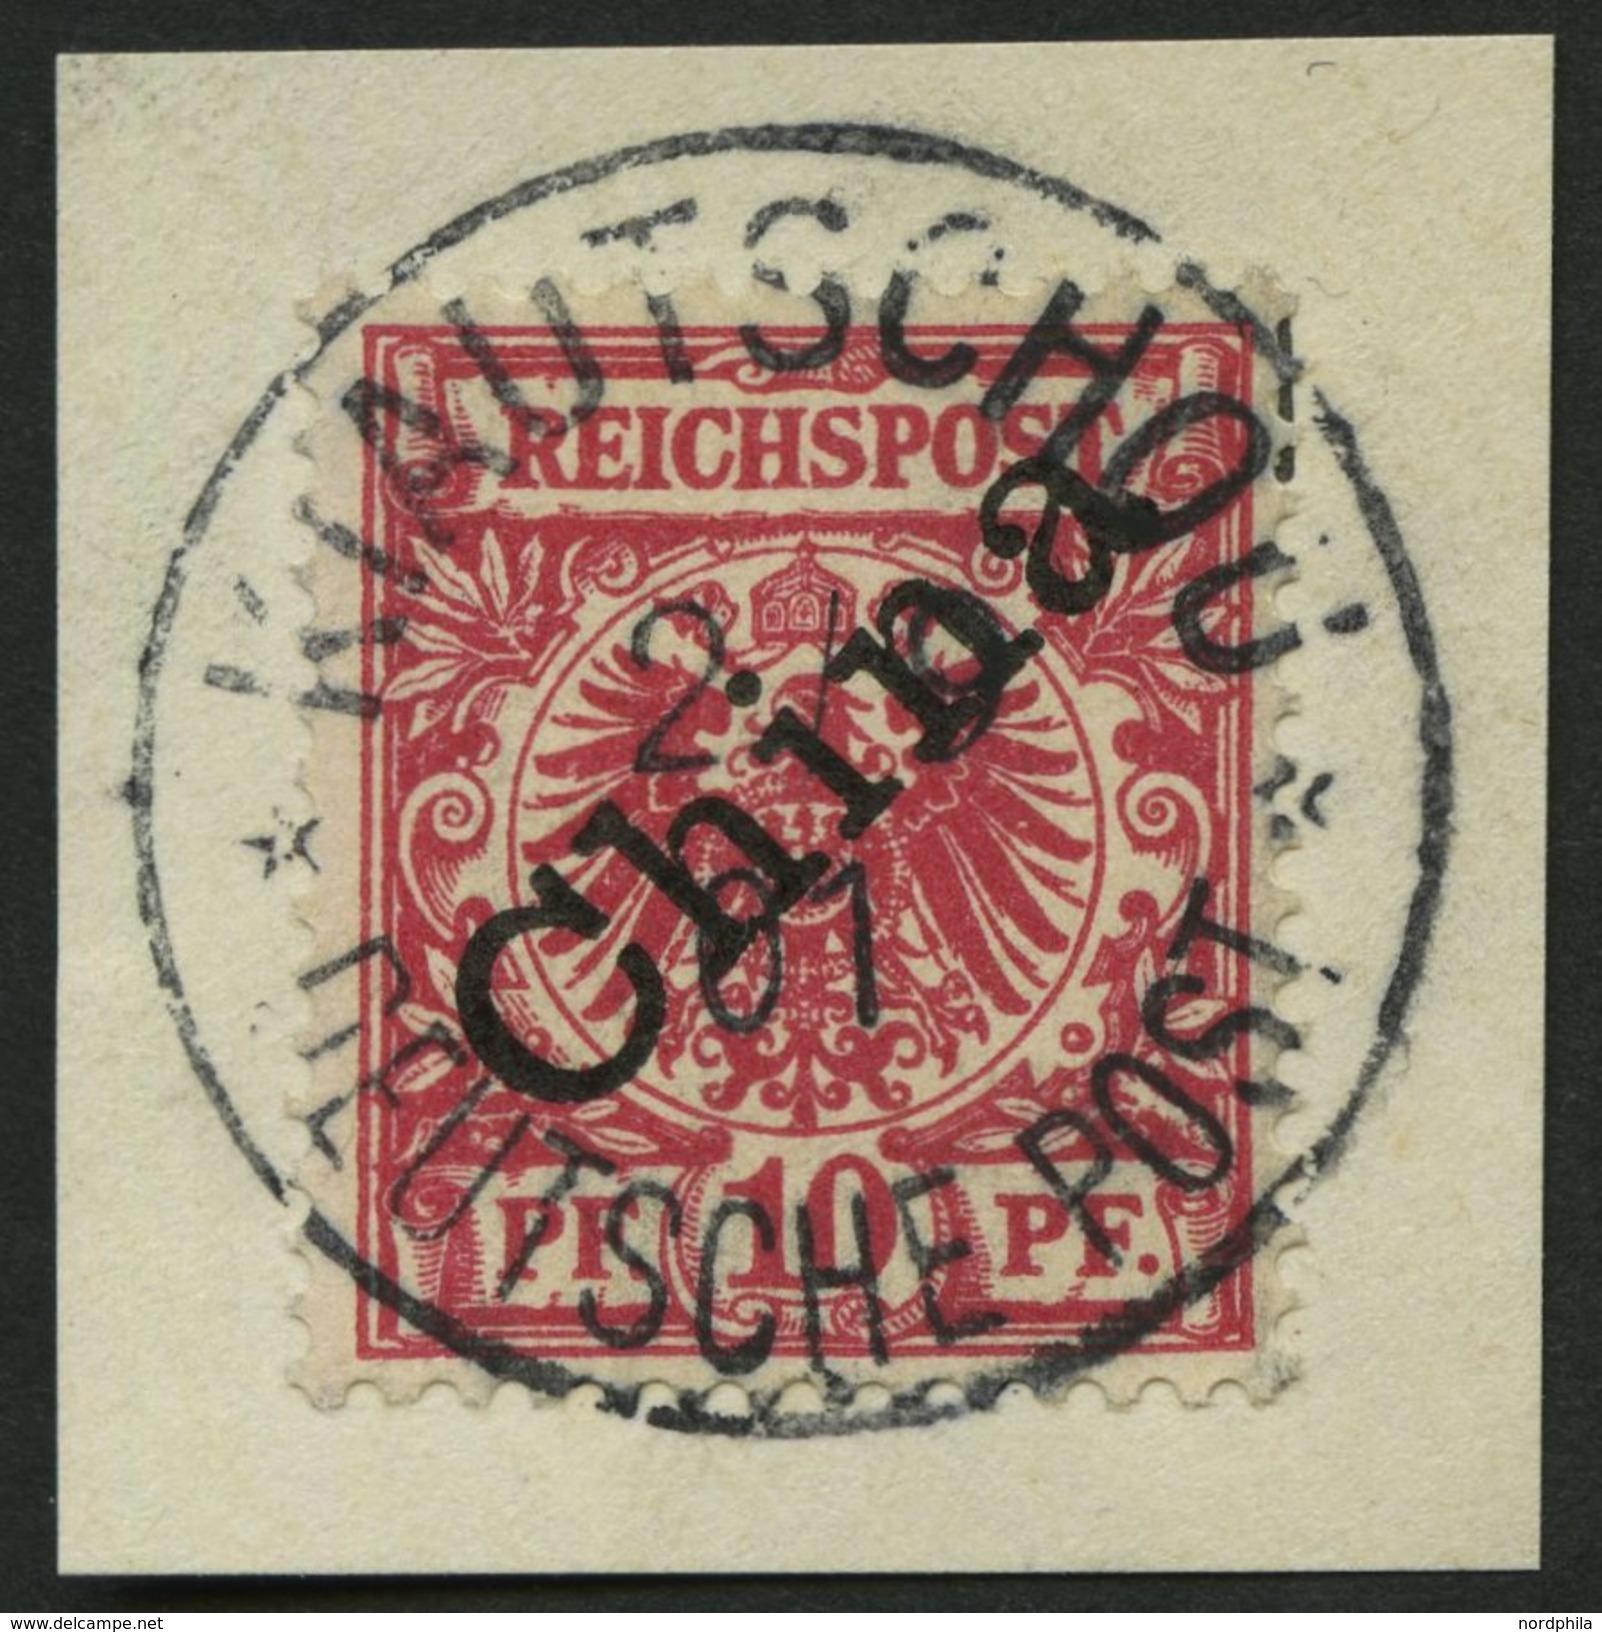 KIAUTSCHOU V 3I BrfStk, 1901, 10 Pf. Diagonaler Aufdruck, Idealer Stempel KIAUTSCHOU DP **, Kabinettbriefstück, R! - Kolonie: Kiautschou